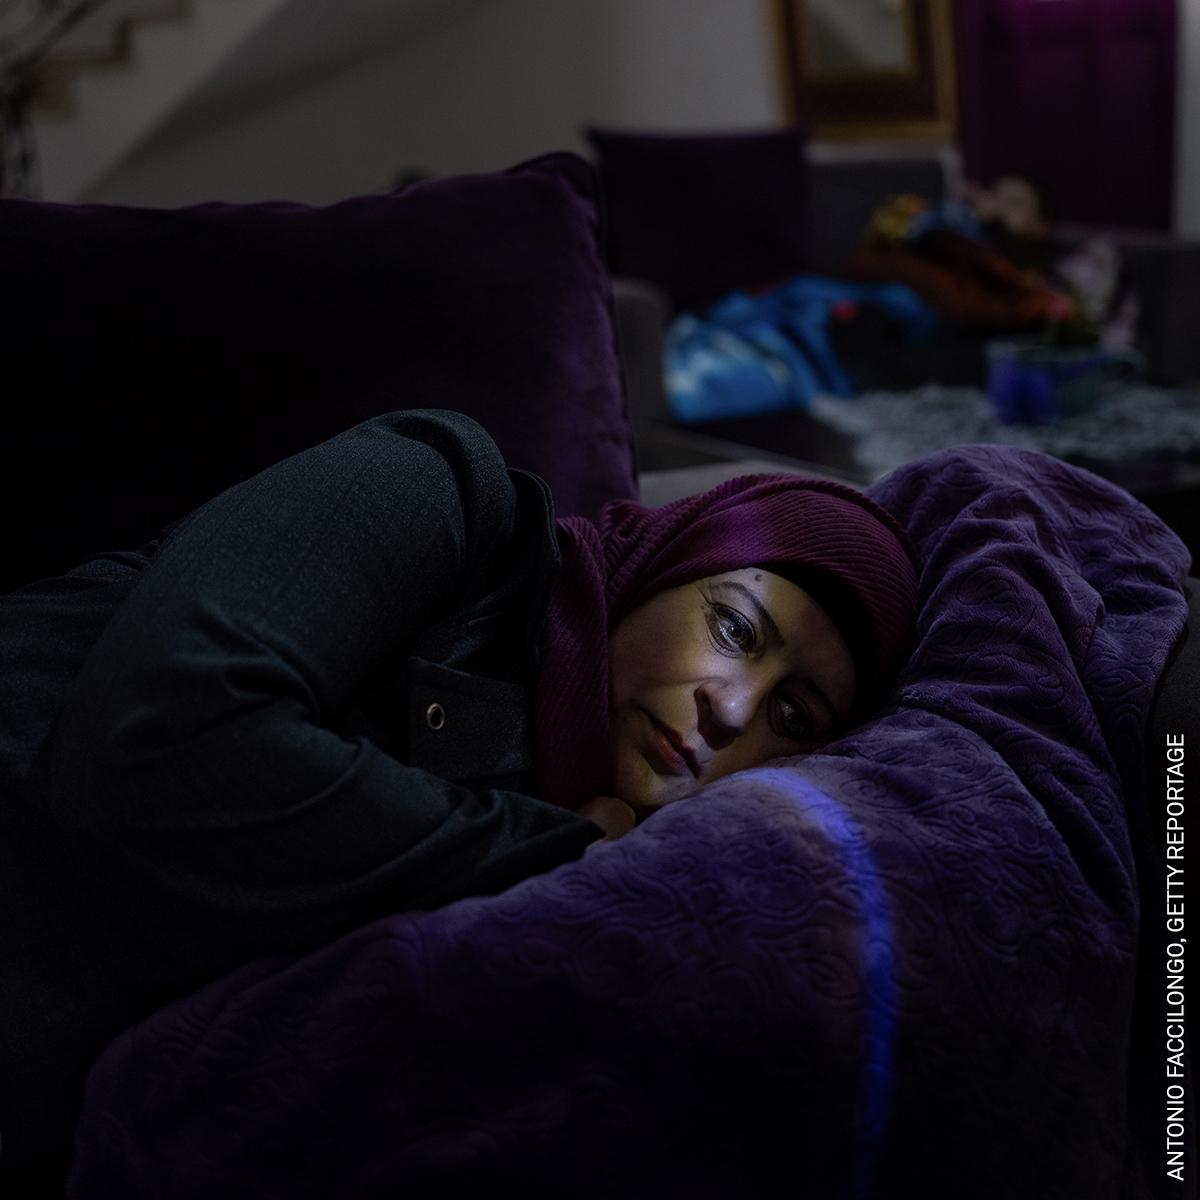 012_World Press Photo Story of the Year Nominee_Online_Antonio Faccilongo_Getty Reportage